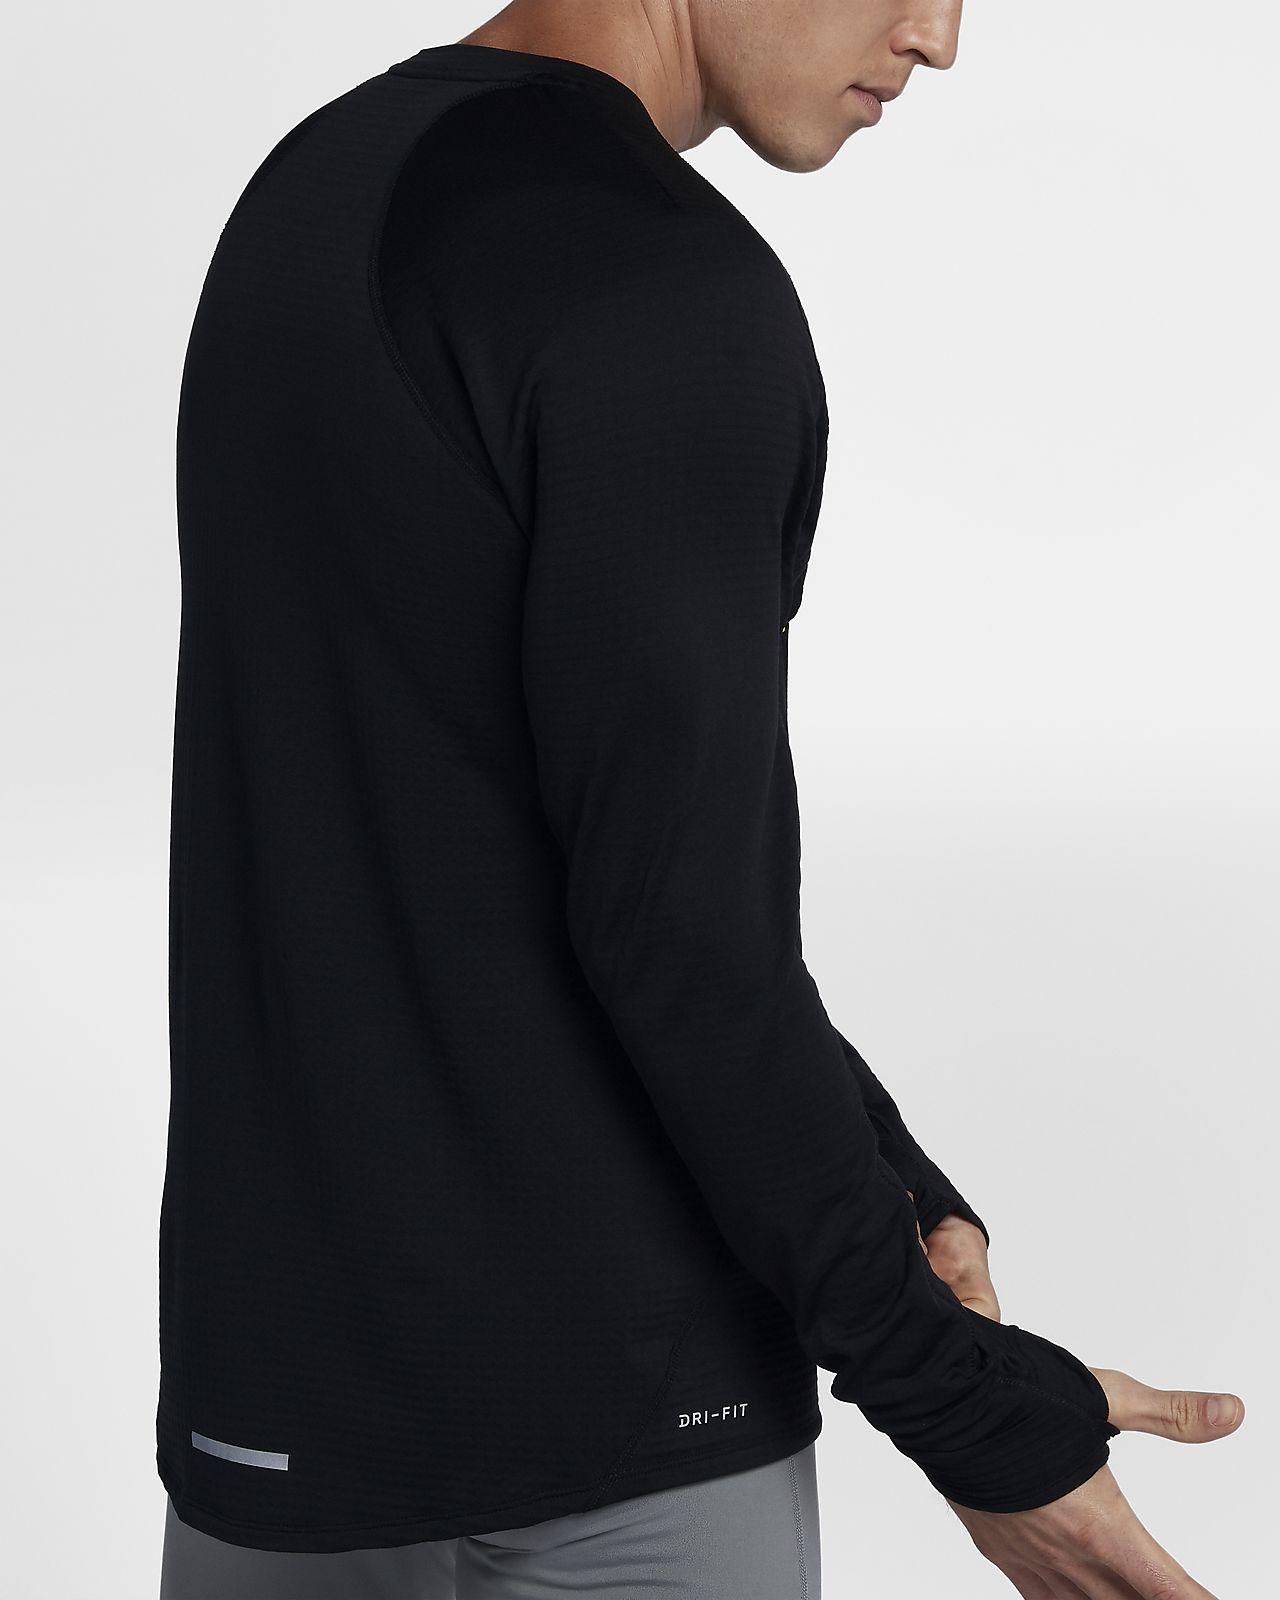 c242da8a Nike Therma-Sphere Men's Long-Sleeve Running Top. Nike.com AU